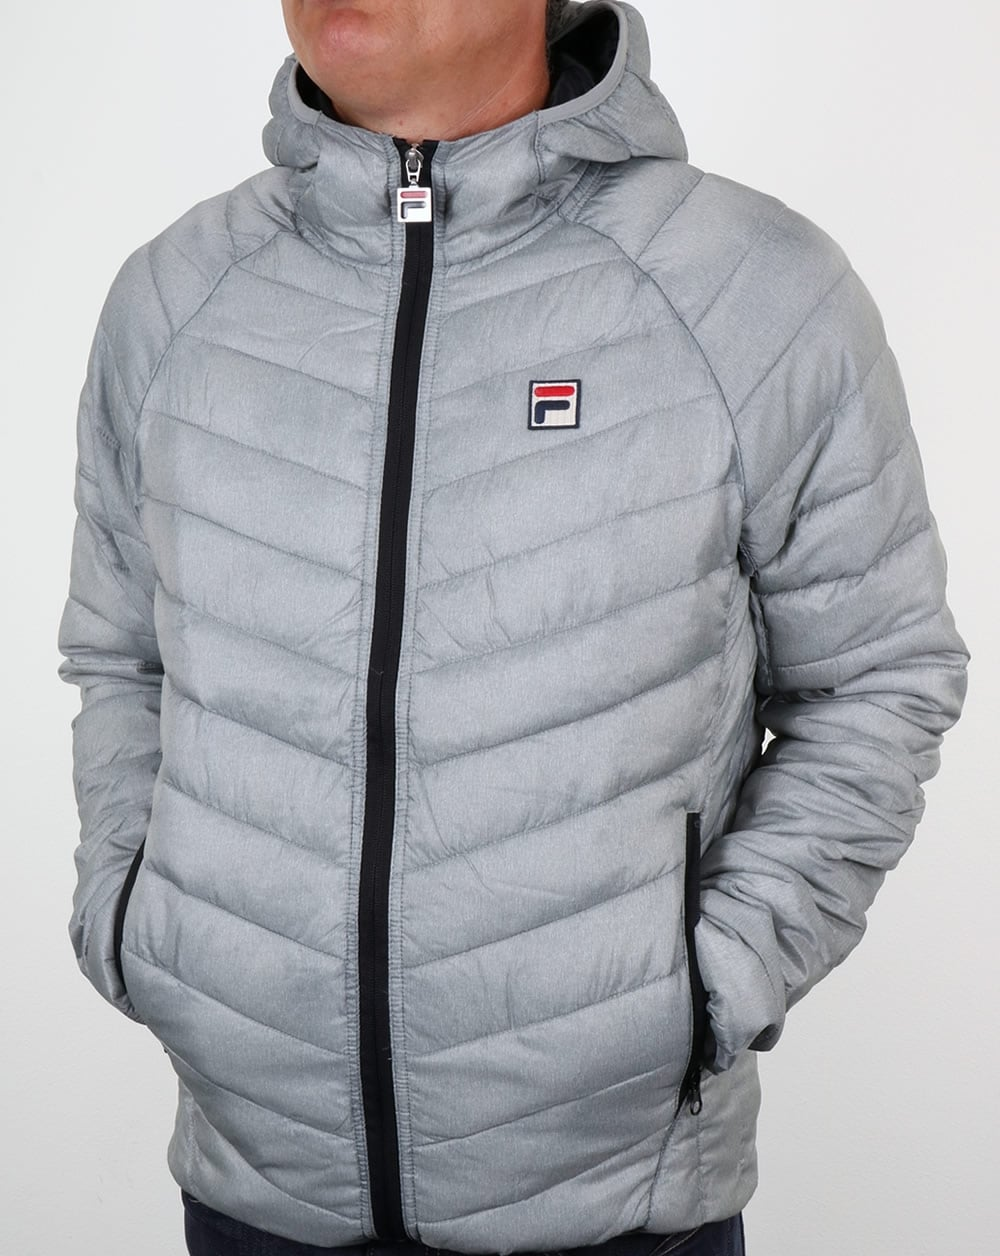 Fila Vintage Jacket,coat,padded, puffer